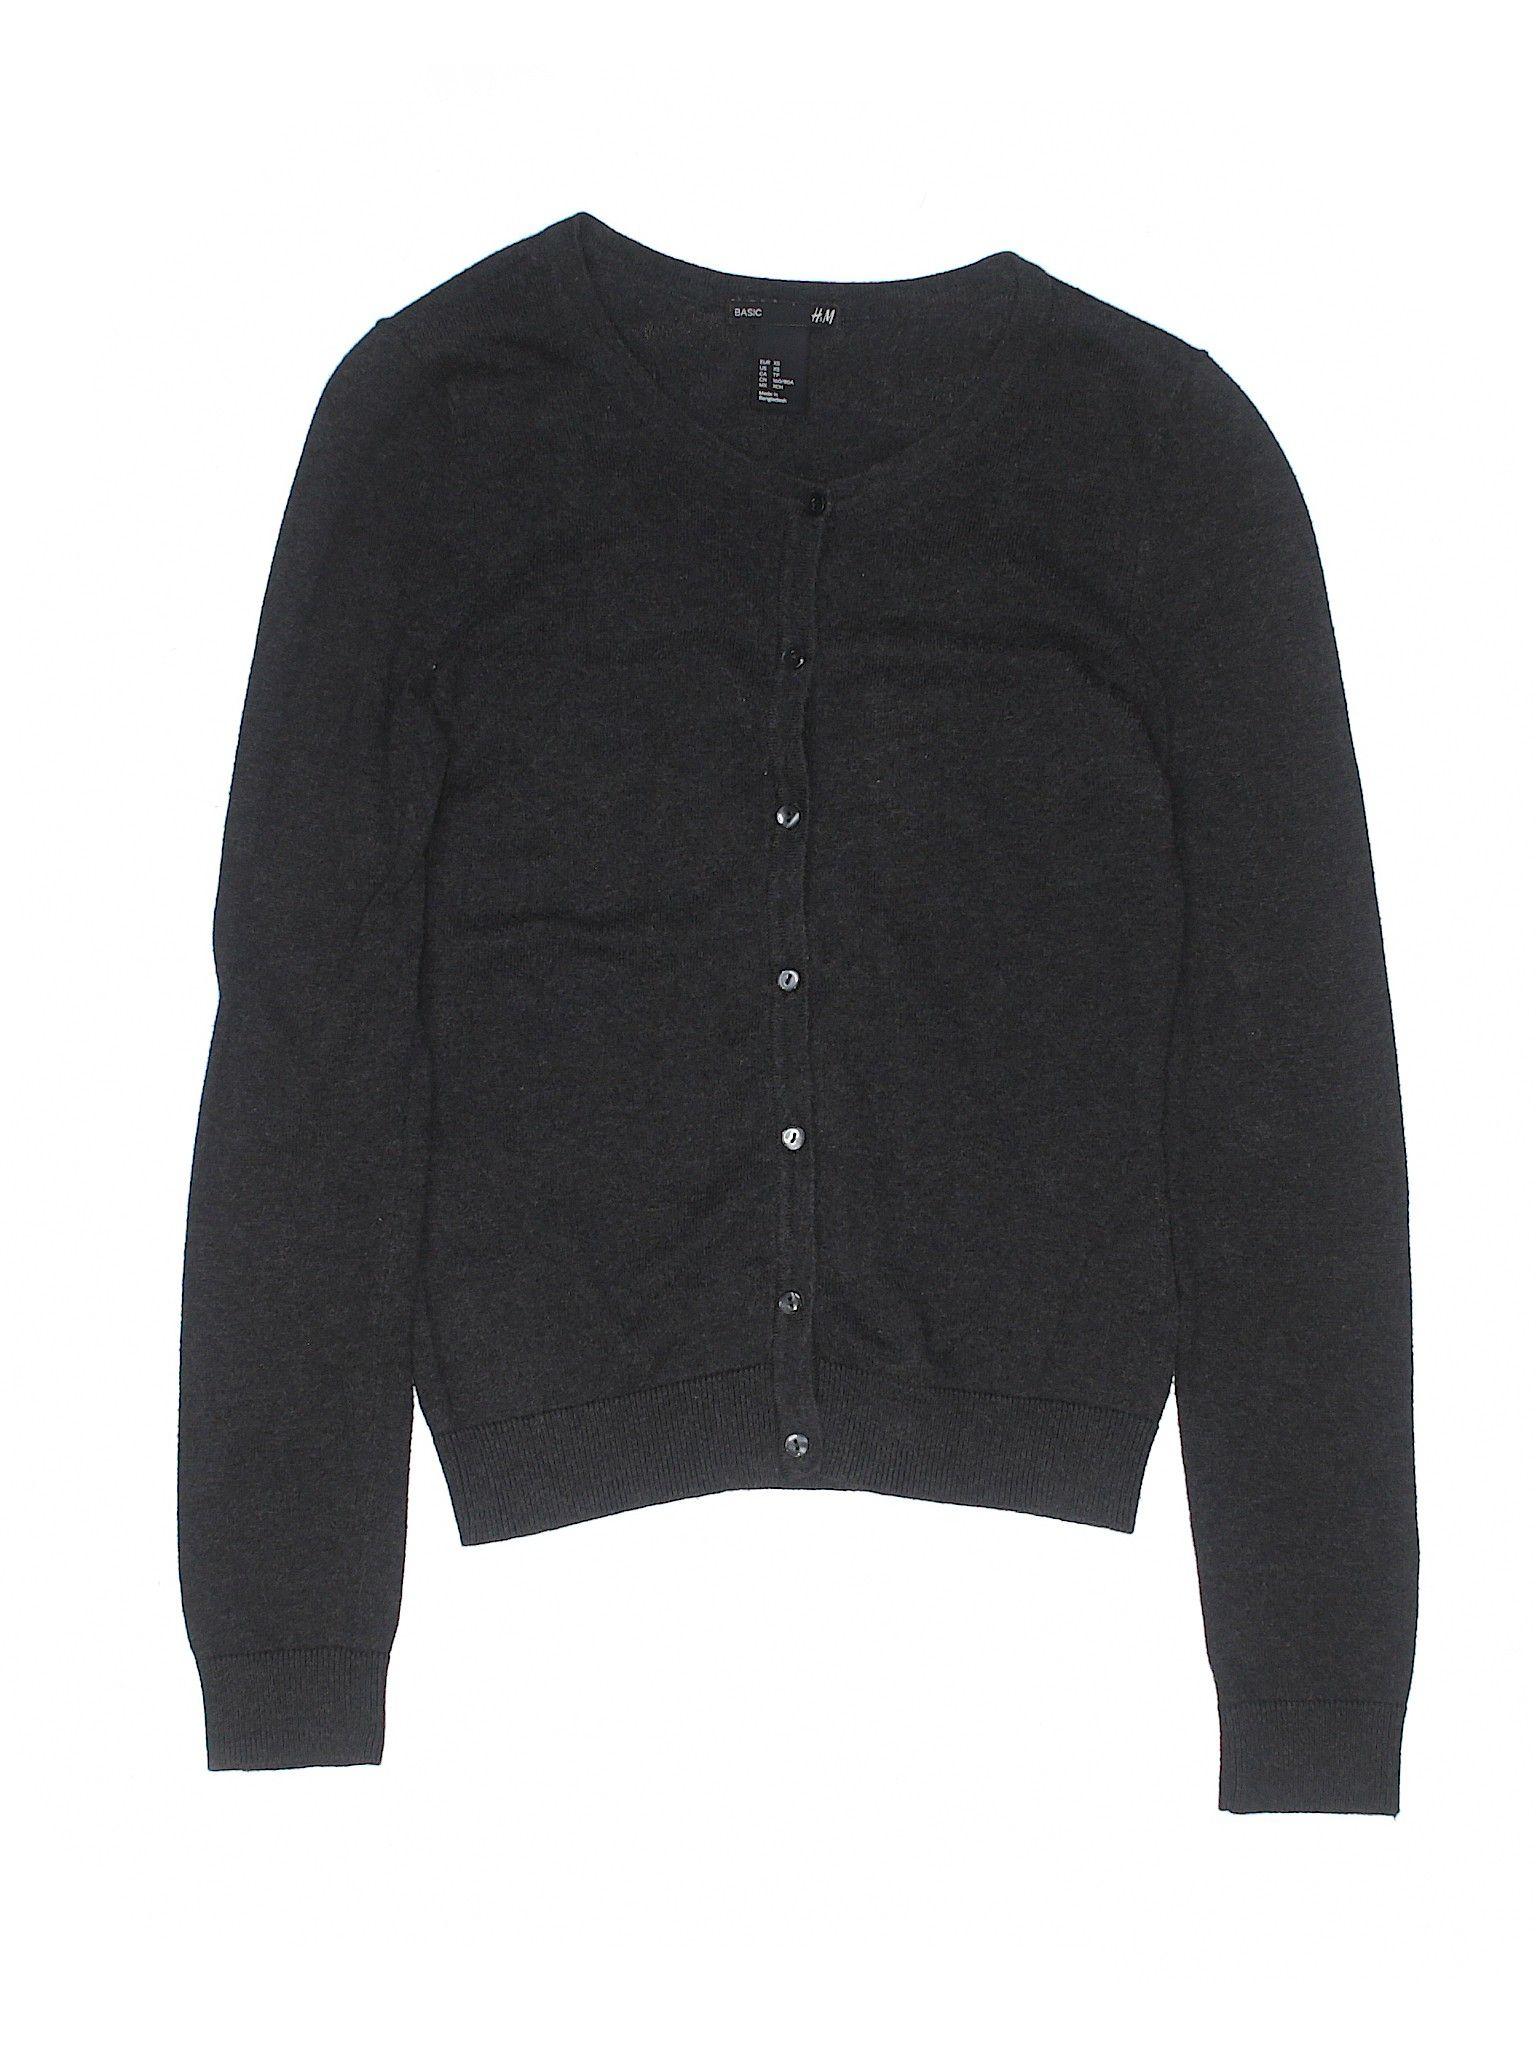 Banana Republic Womens Supersoft Cotton Blend Boyfriend Cardigan Sweater  Black  0ebb66471